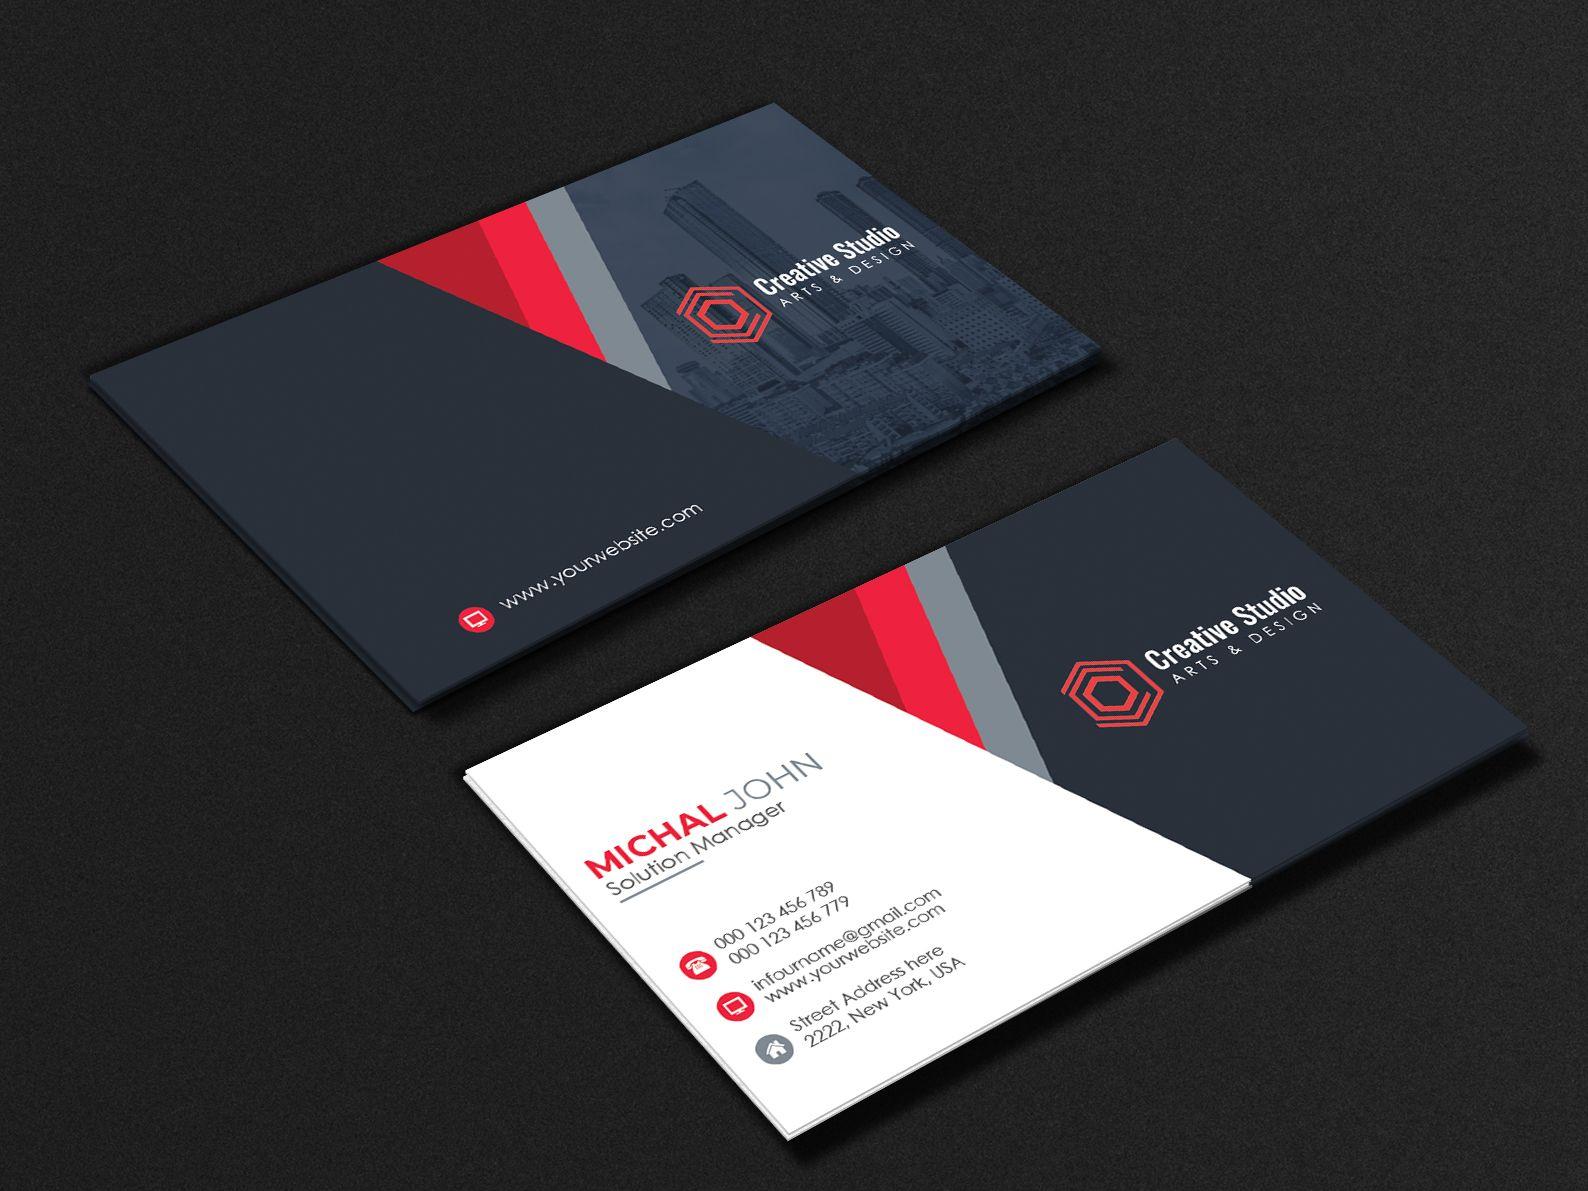 Corporate Business Card Minimalist Business Cards Business Card Design Corporate Business Card